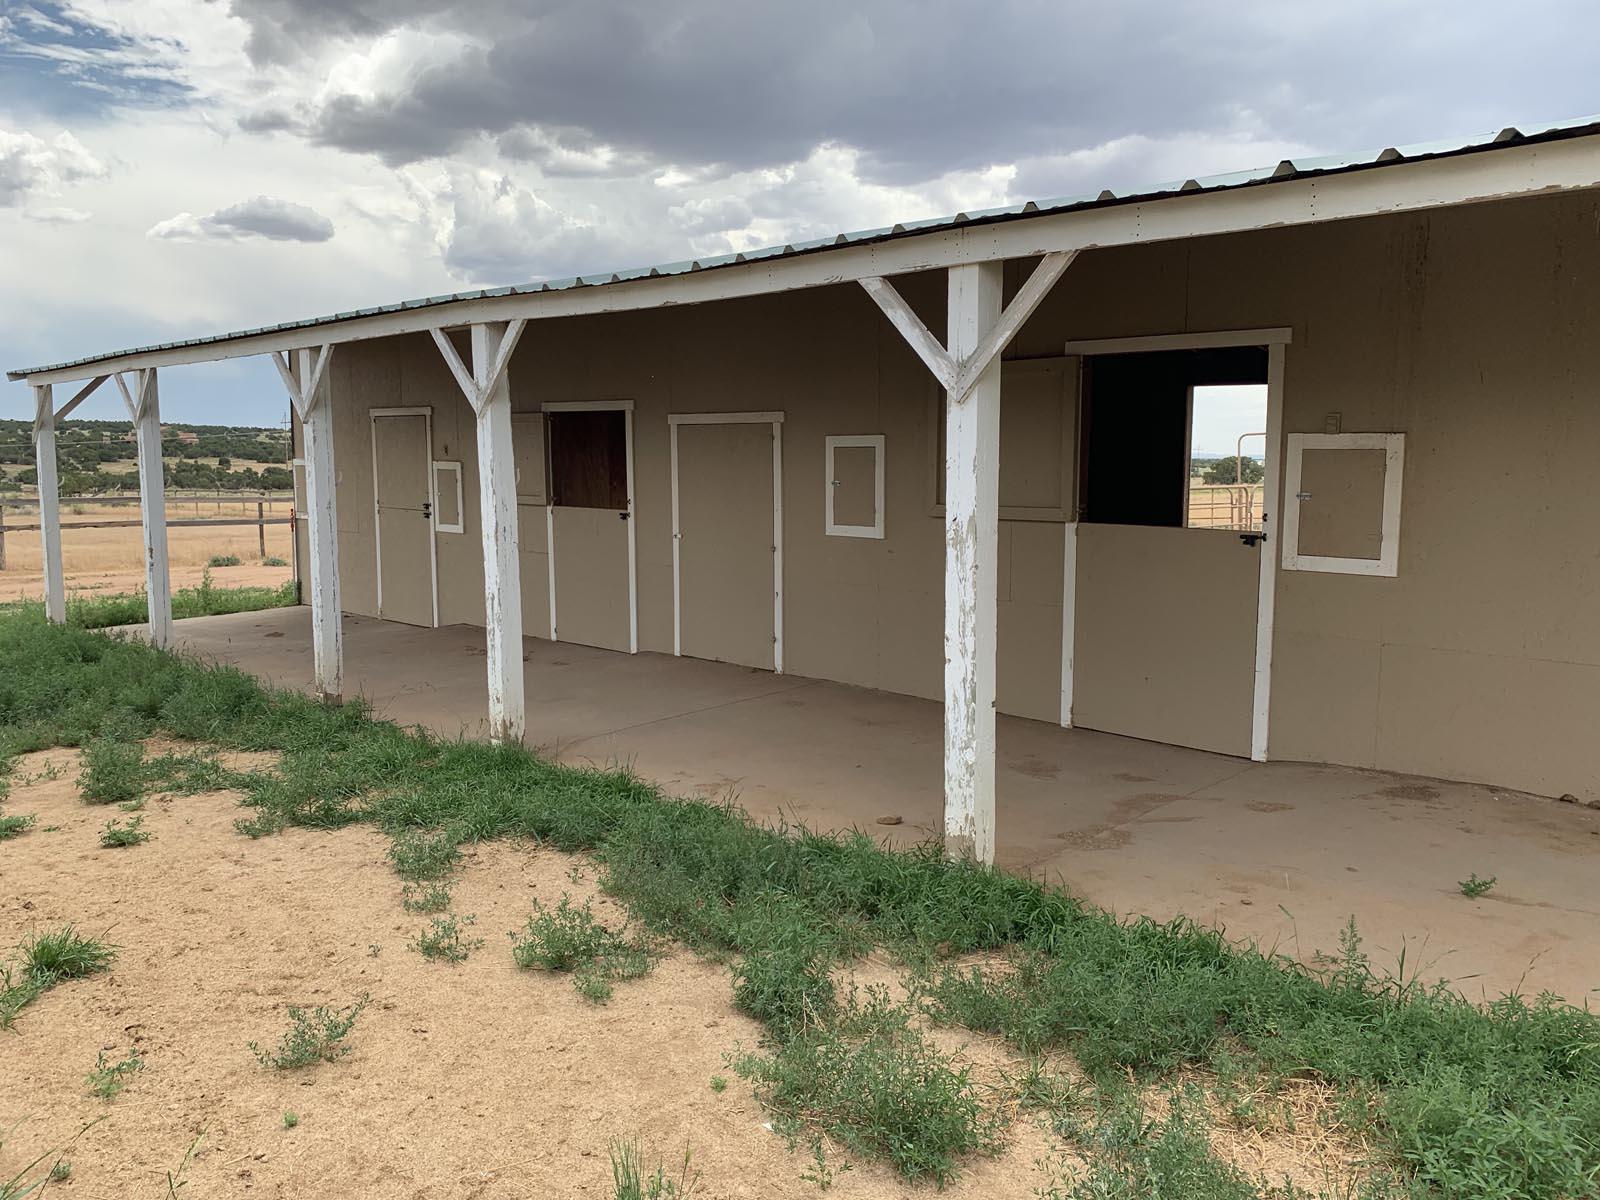 Stalls at Tiger Owl Ranch horse boarding facility in Santa Fe, New Mexico